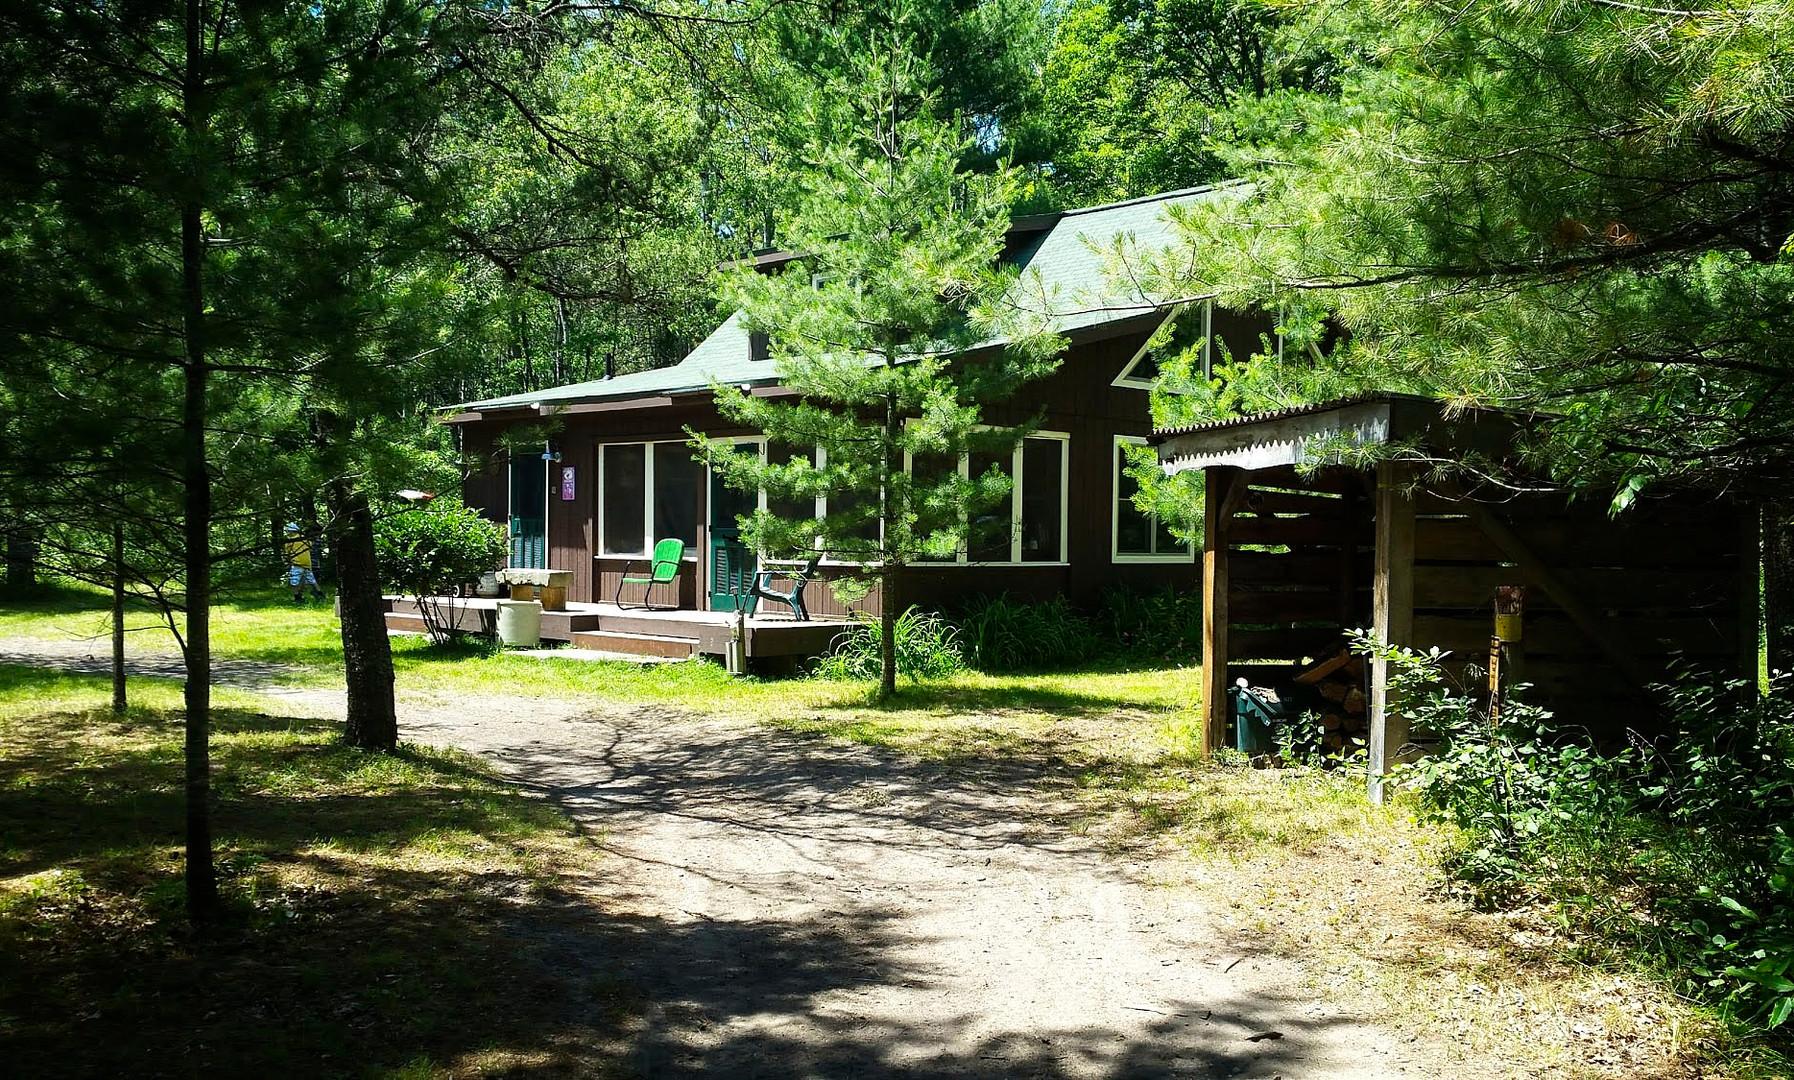 Cabin Driveway